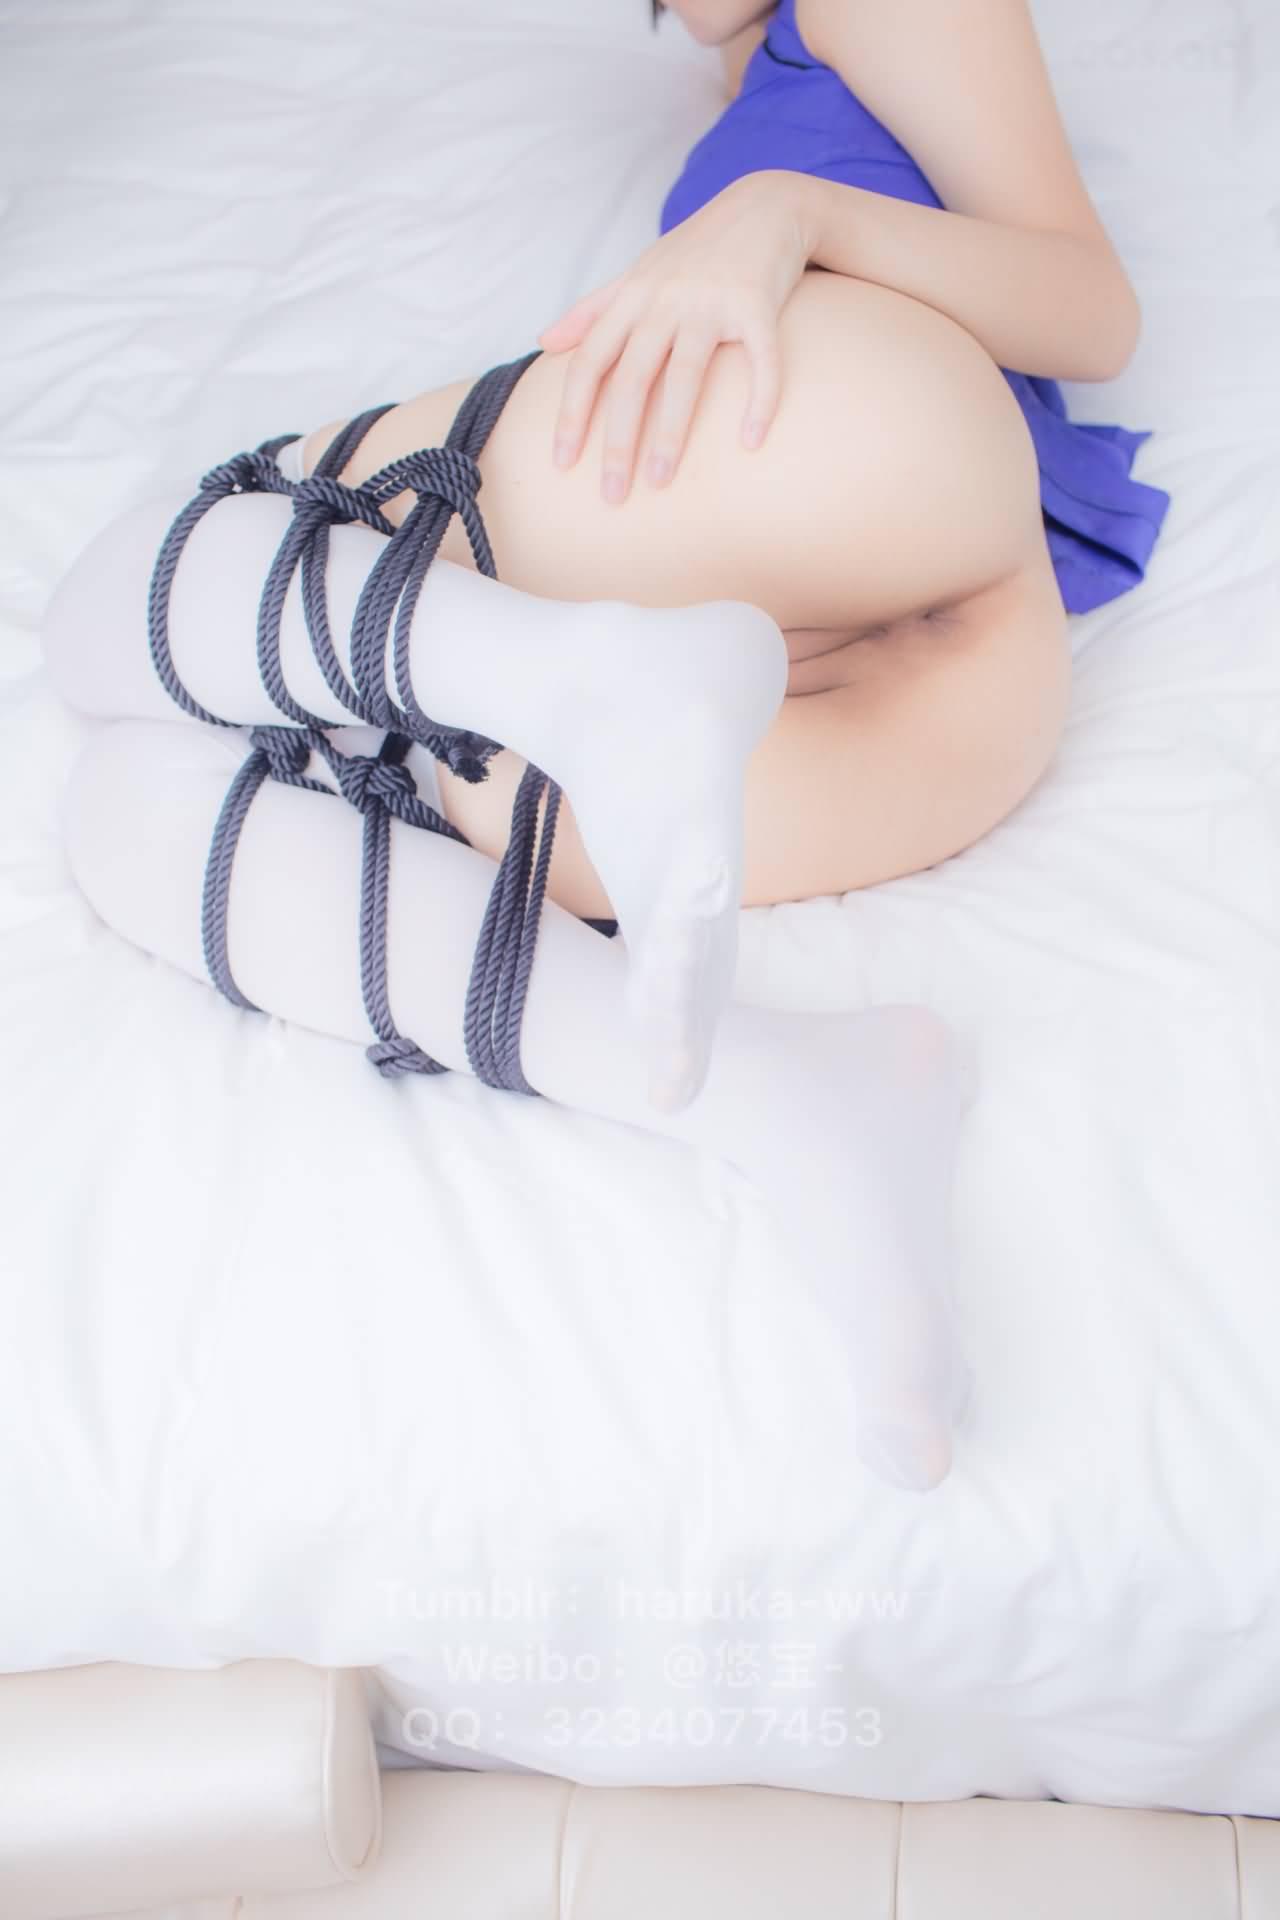 50CrNR - Young japanese school girl white stockings cheongsam 悠宝三岁 白丝旗袍